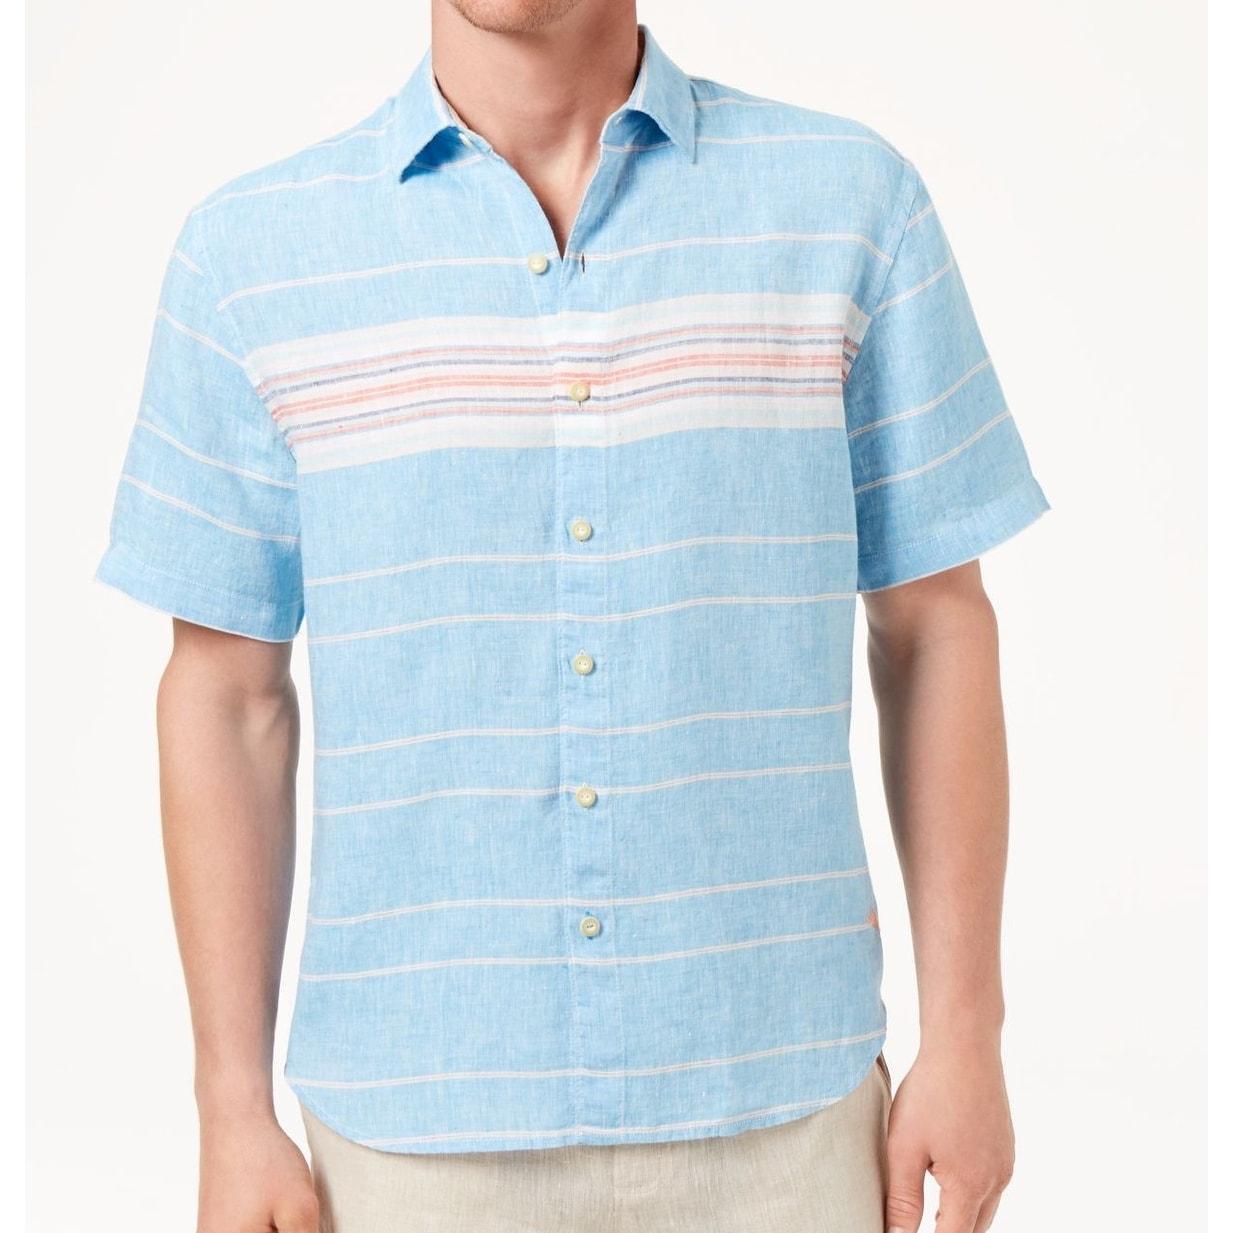 f4e2b8ba148b4 Tommy Bahama Shirts